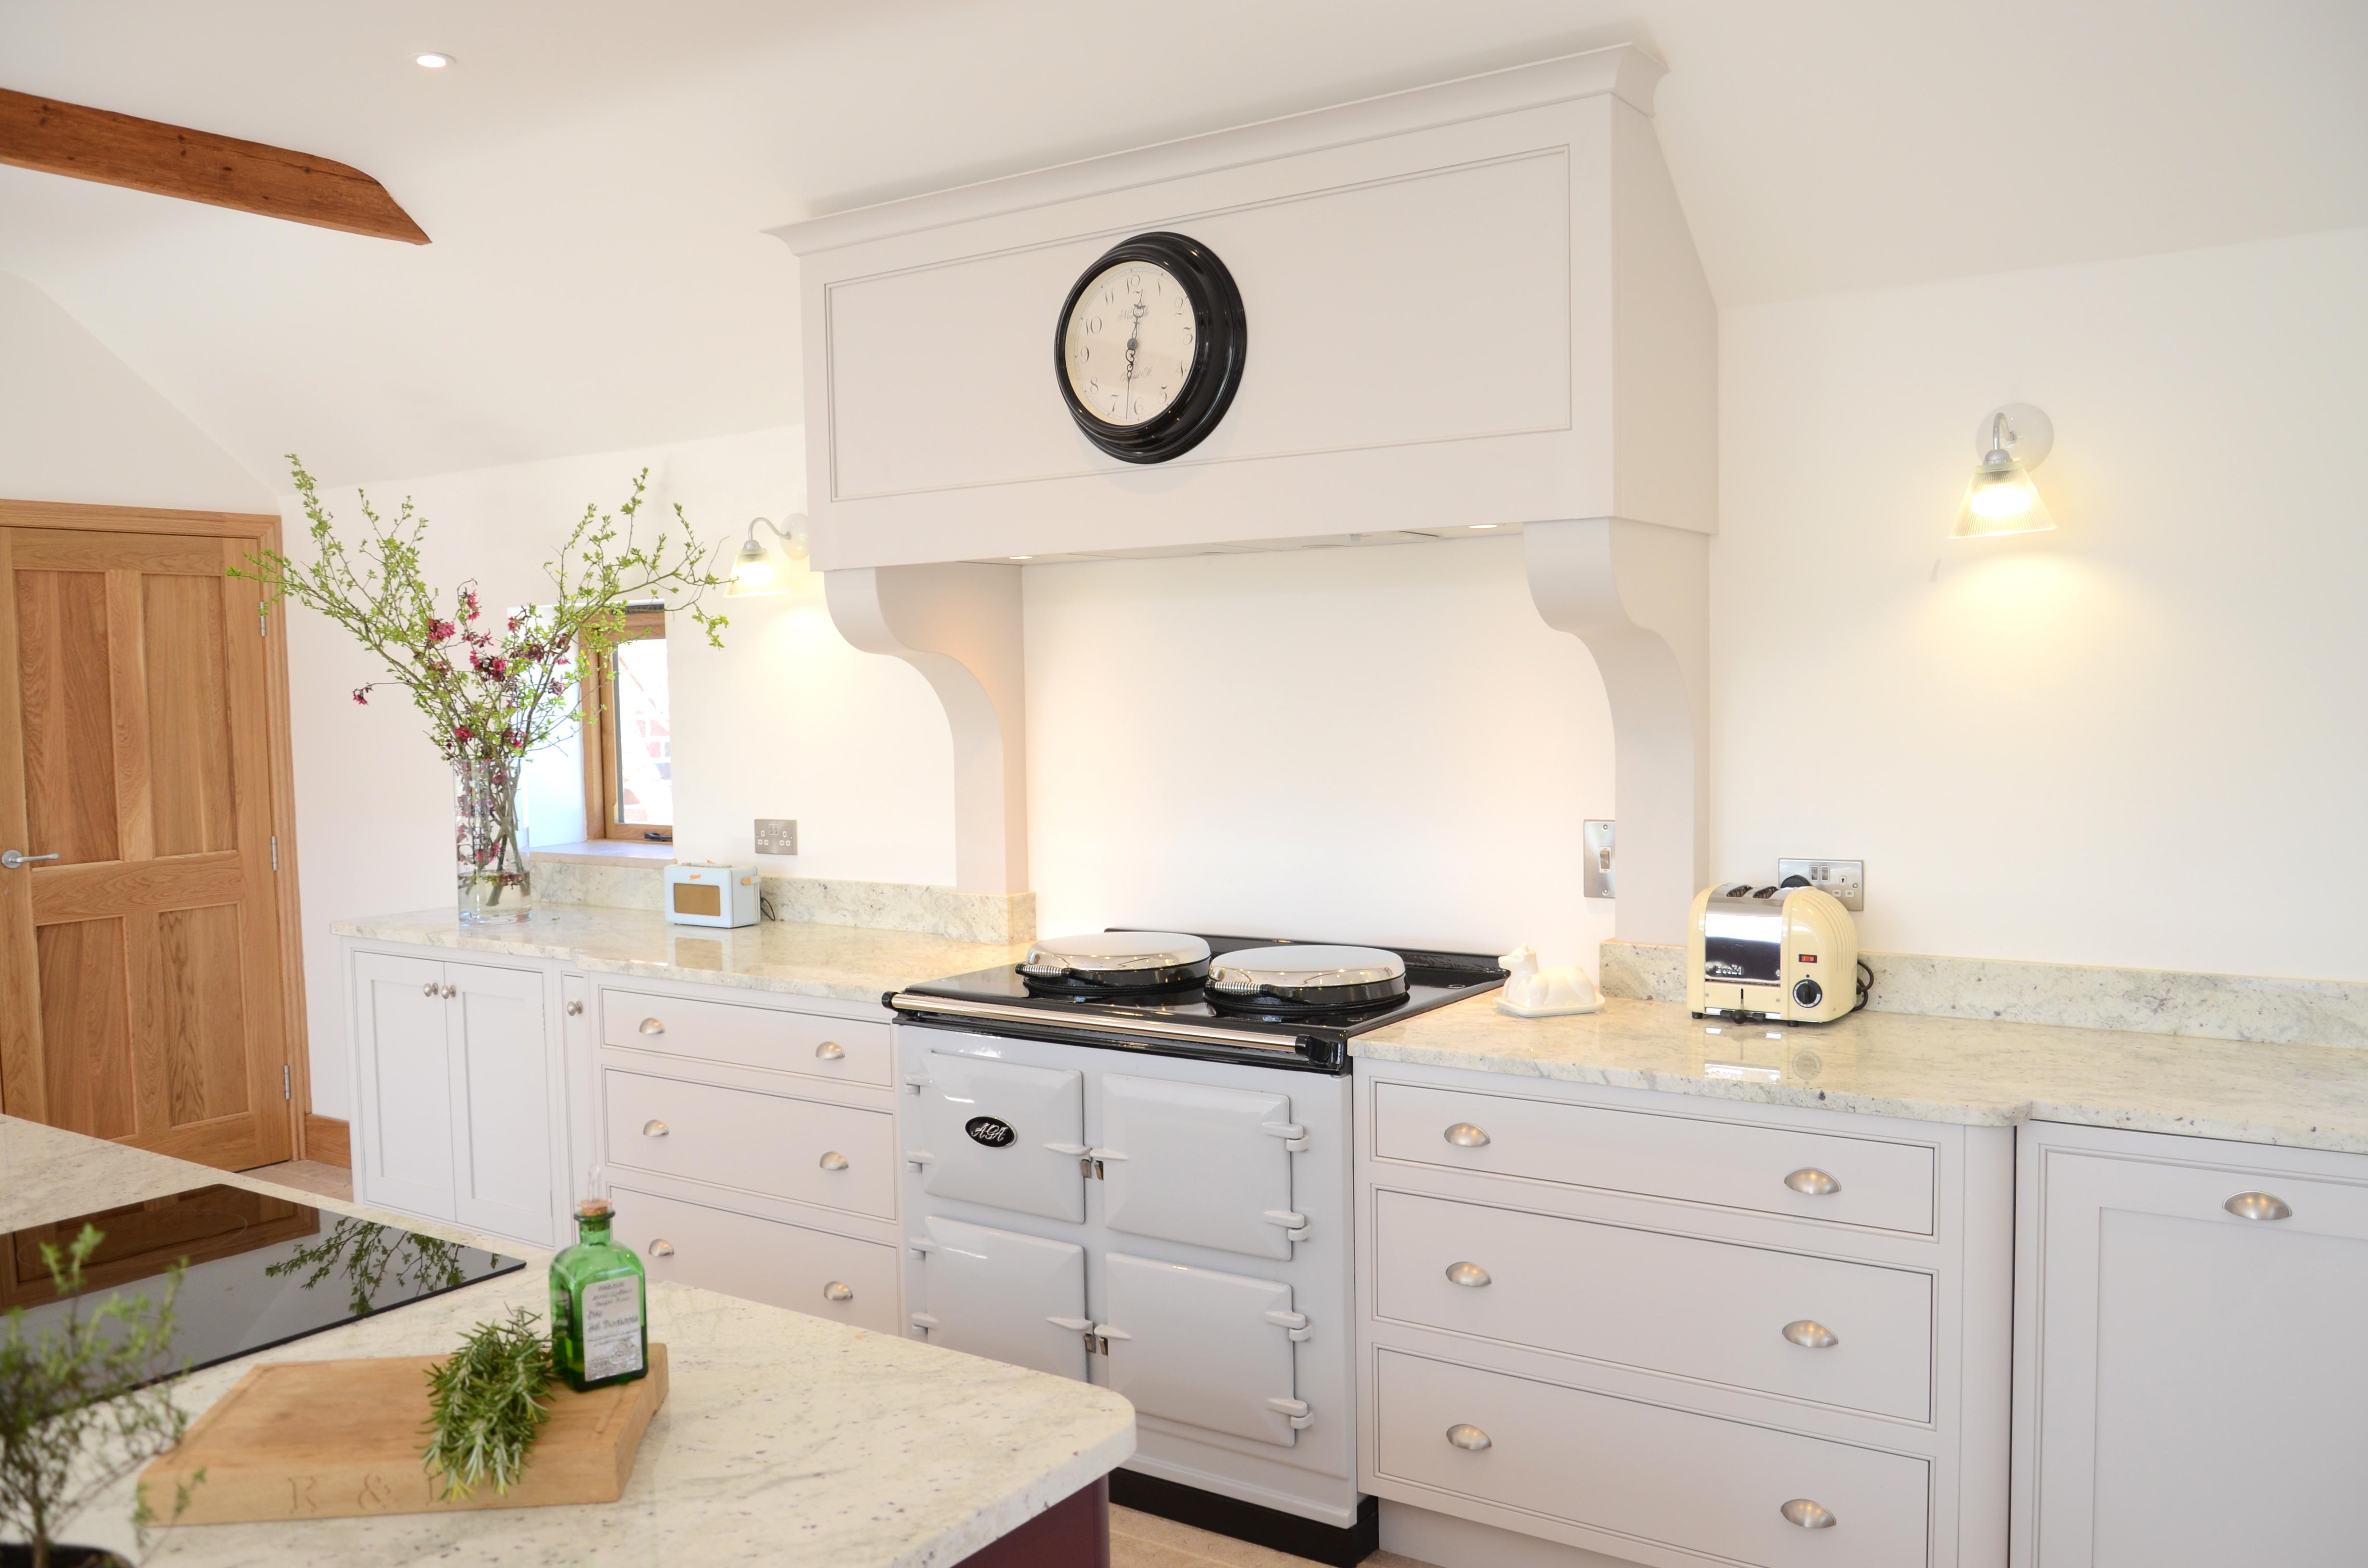 A Summertime Kitchen - Willow Bank